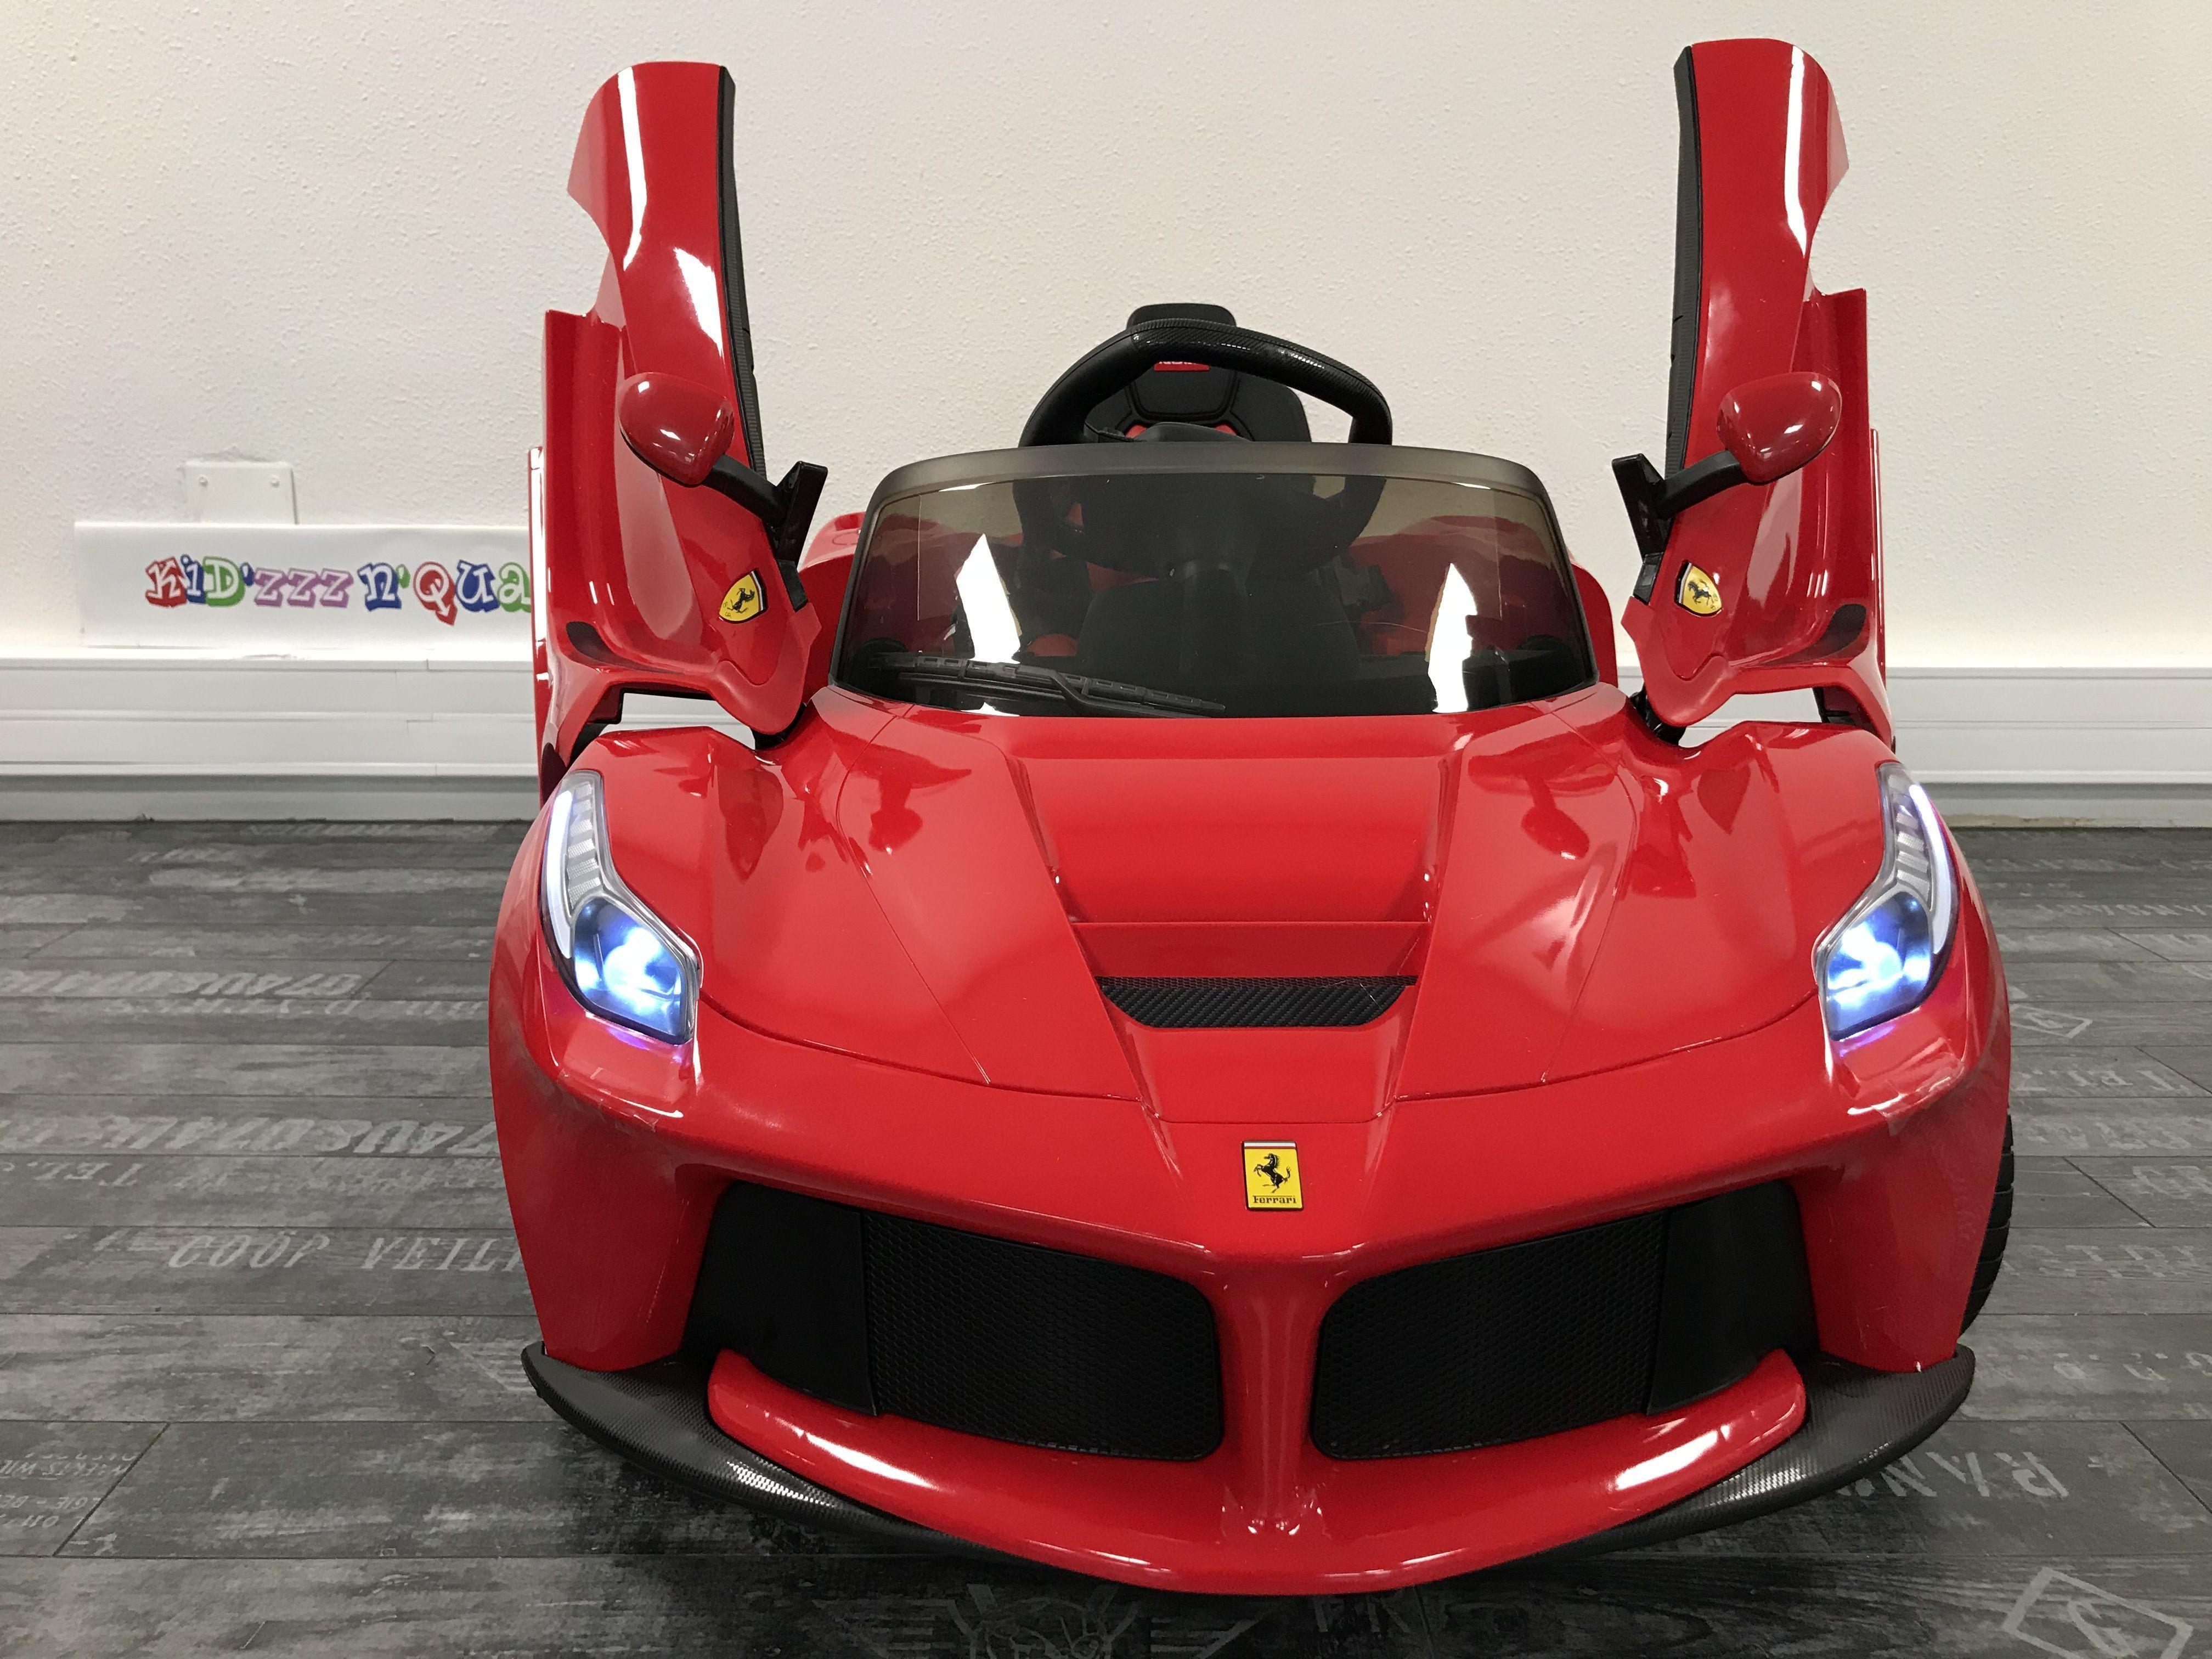 Voiture Bébé 12v Ferrari Fxx K Ferrarilaferrari Cette Voiture Bébé Laferrari 12v Est De Toute Beauté Racée élé Kids Power Wheels Ride On Toys Car Gadgets